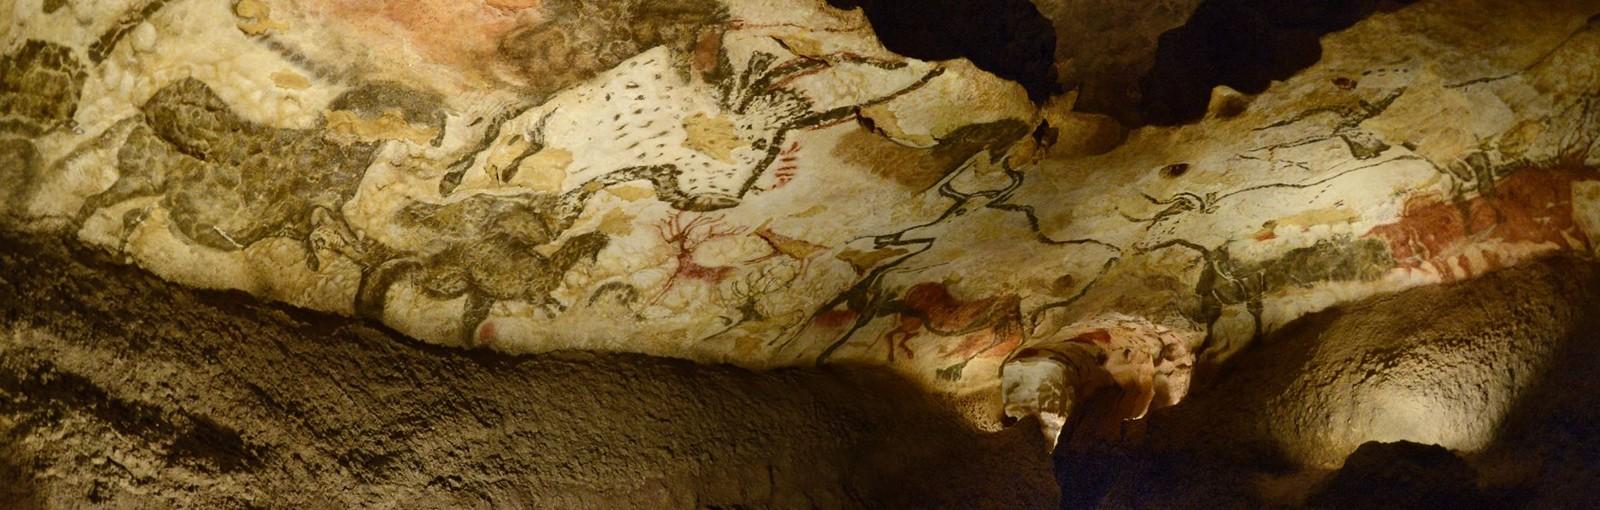 Tours IN THE FOOTSTEPS OF CRO MAGNON: A PREHISTORIC ADVENTURE… - Dordoña y Burdeos - TOURS REGIONALES